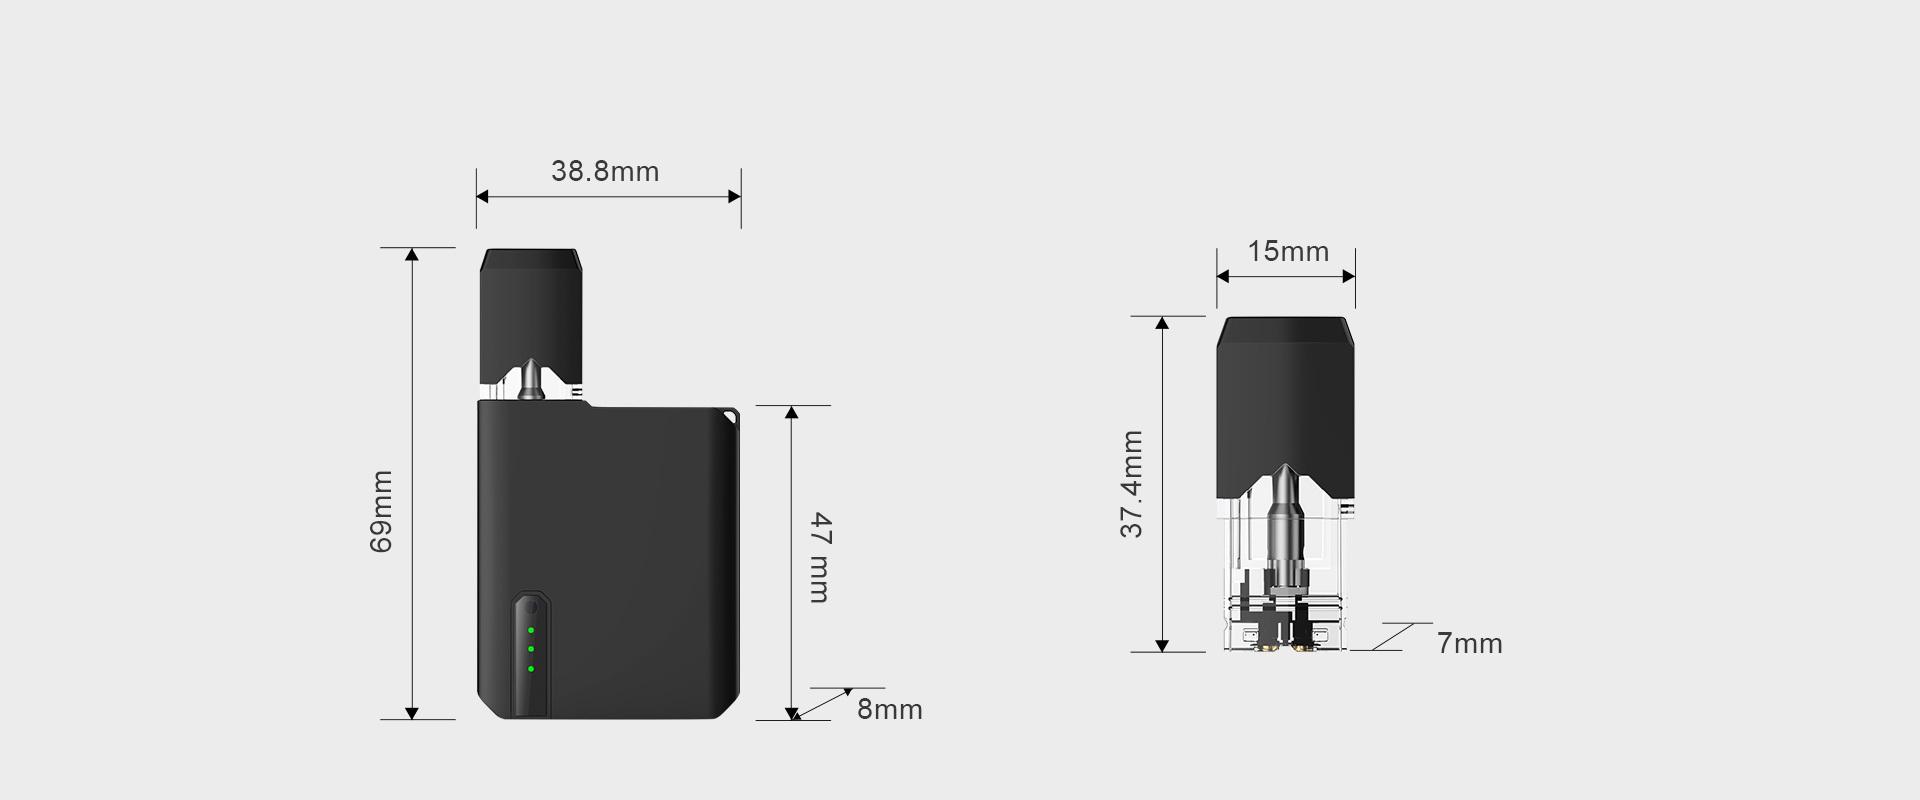 Alpsvape GR8 kit